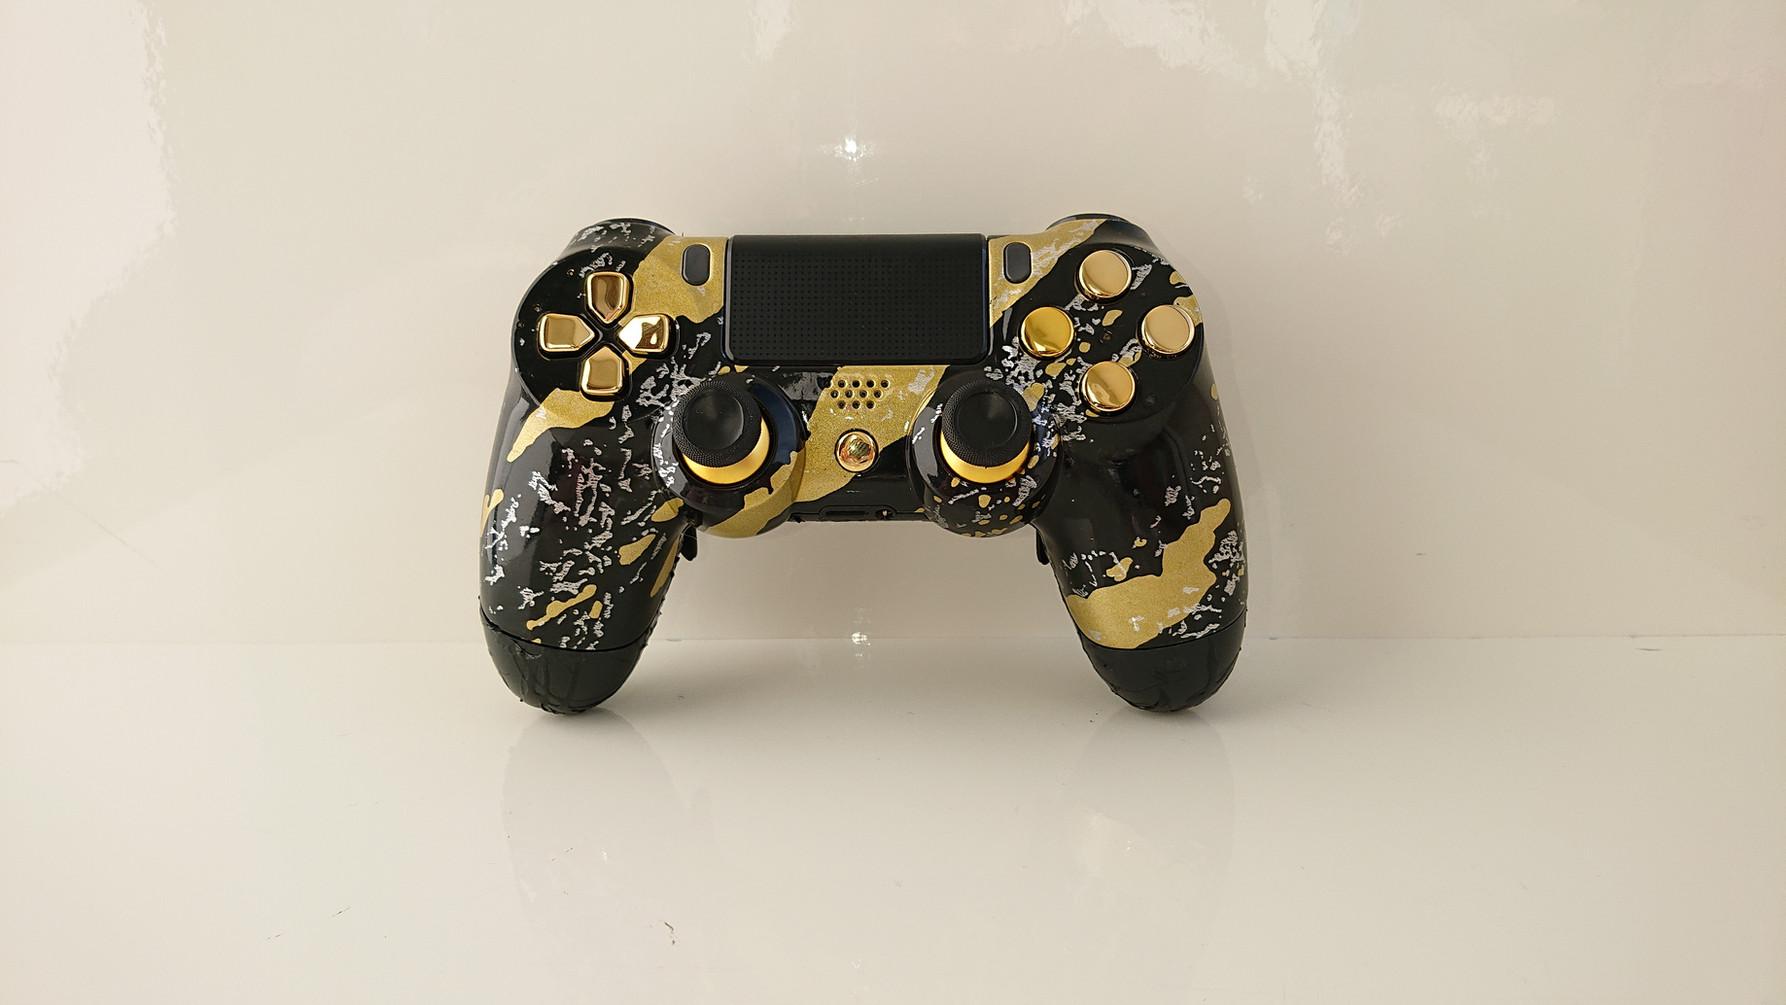 Camoflage Elite Gold